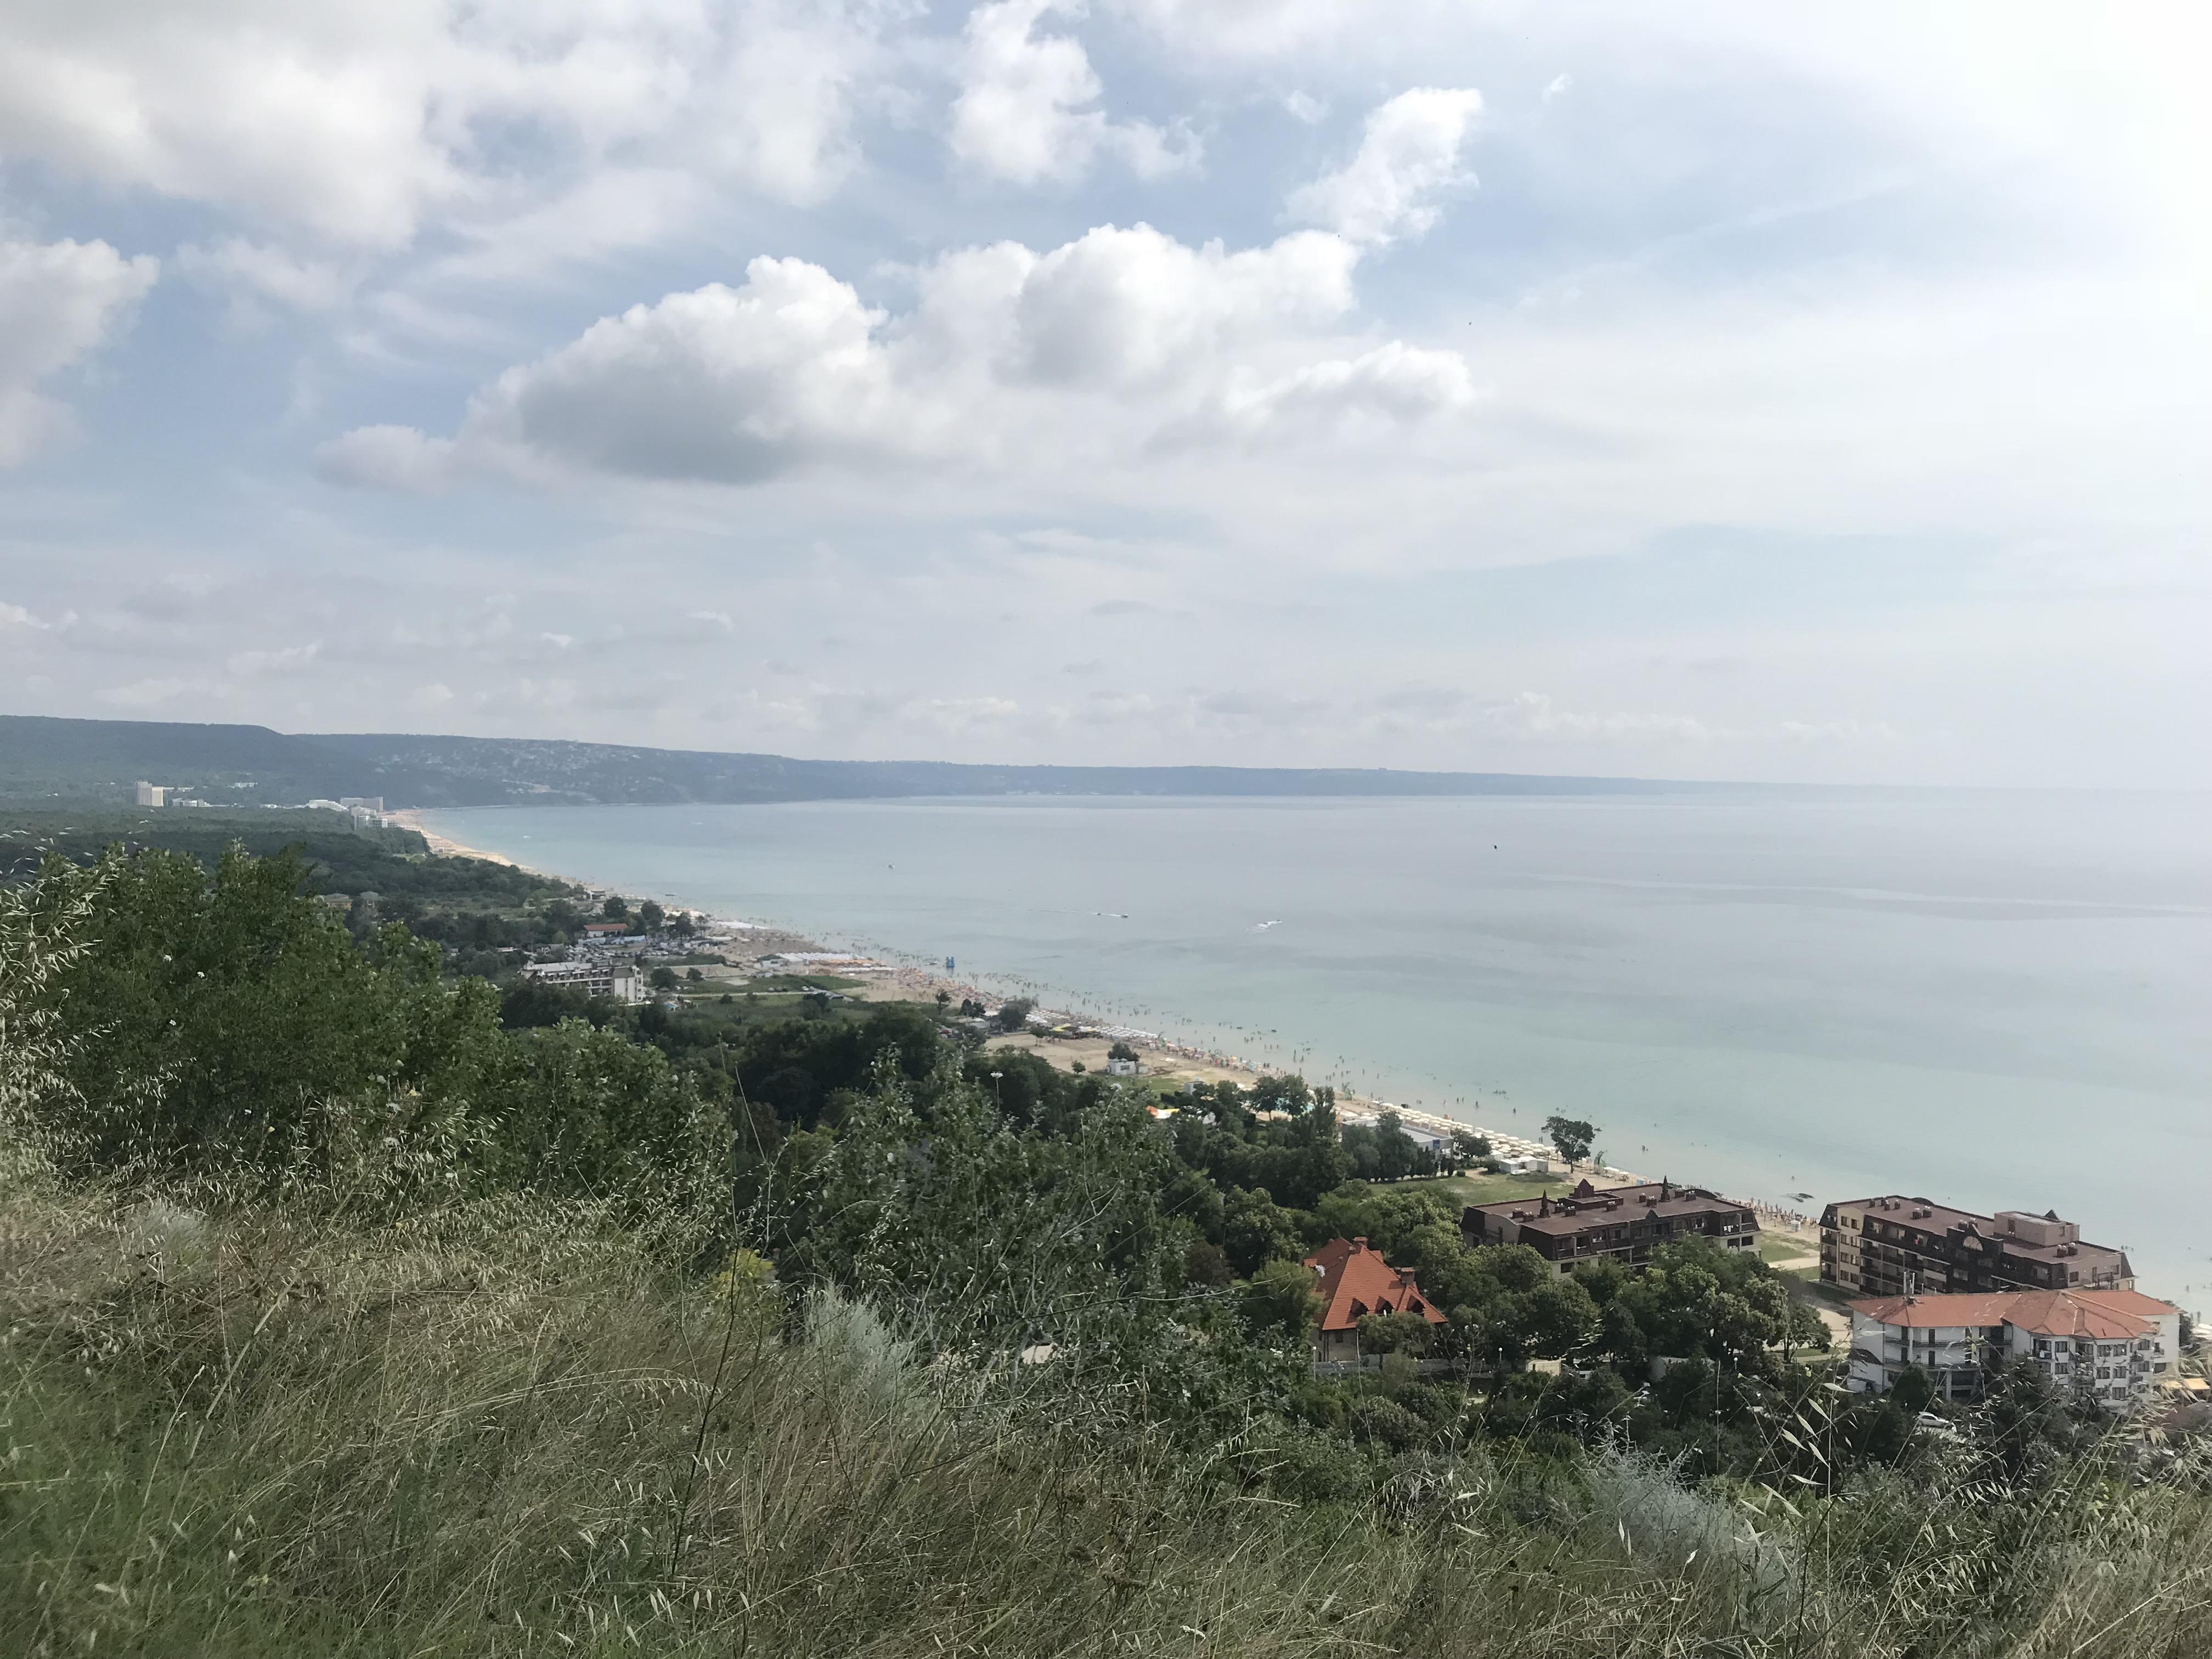 views of Bulgaria coastline on the jeep safari